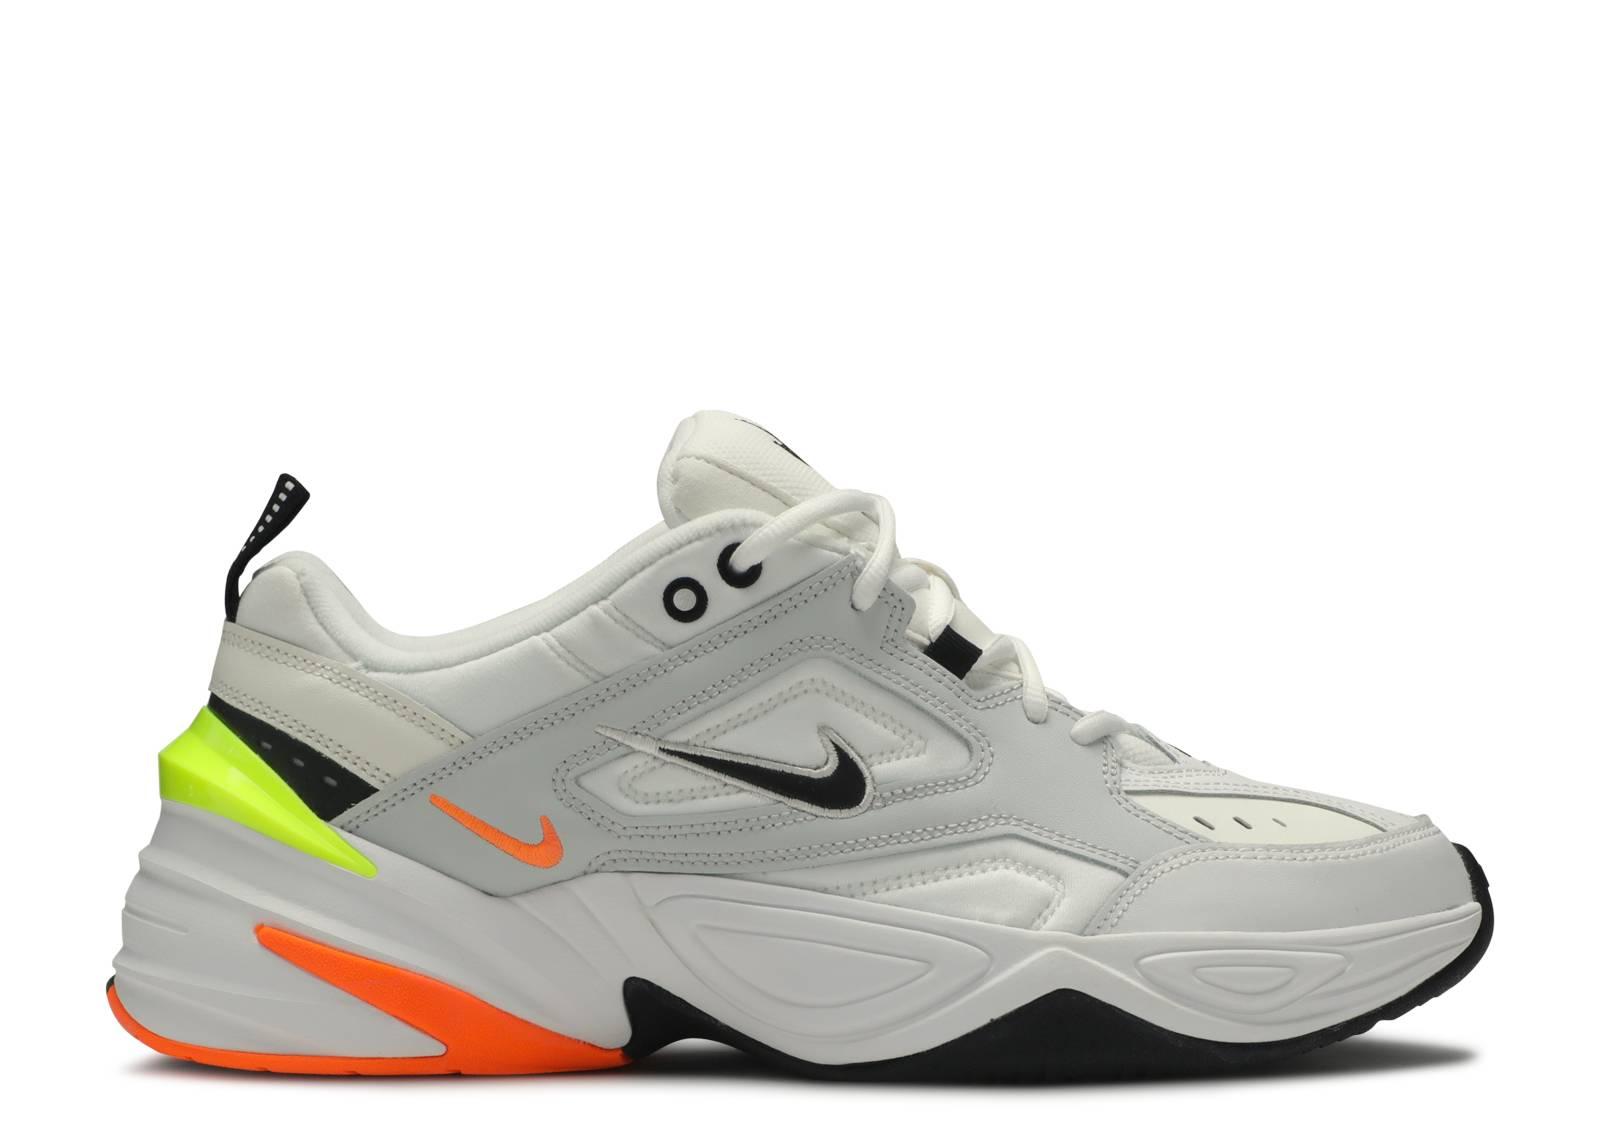 Nike M2k Tekno White White Pure Platinum | Treesse